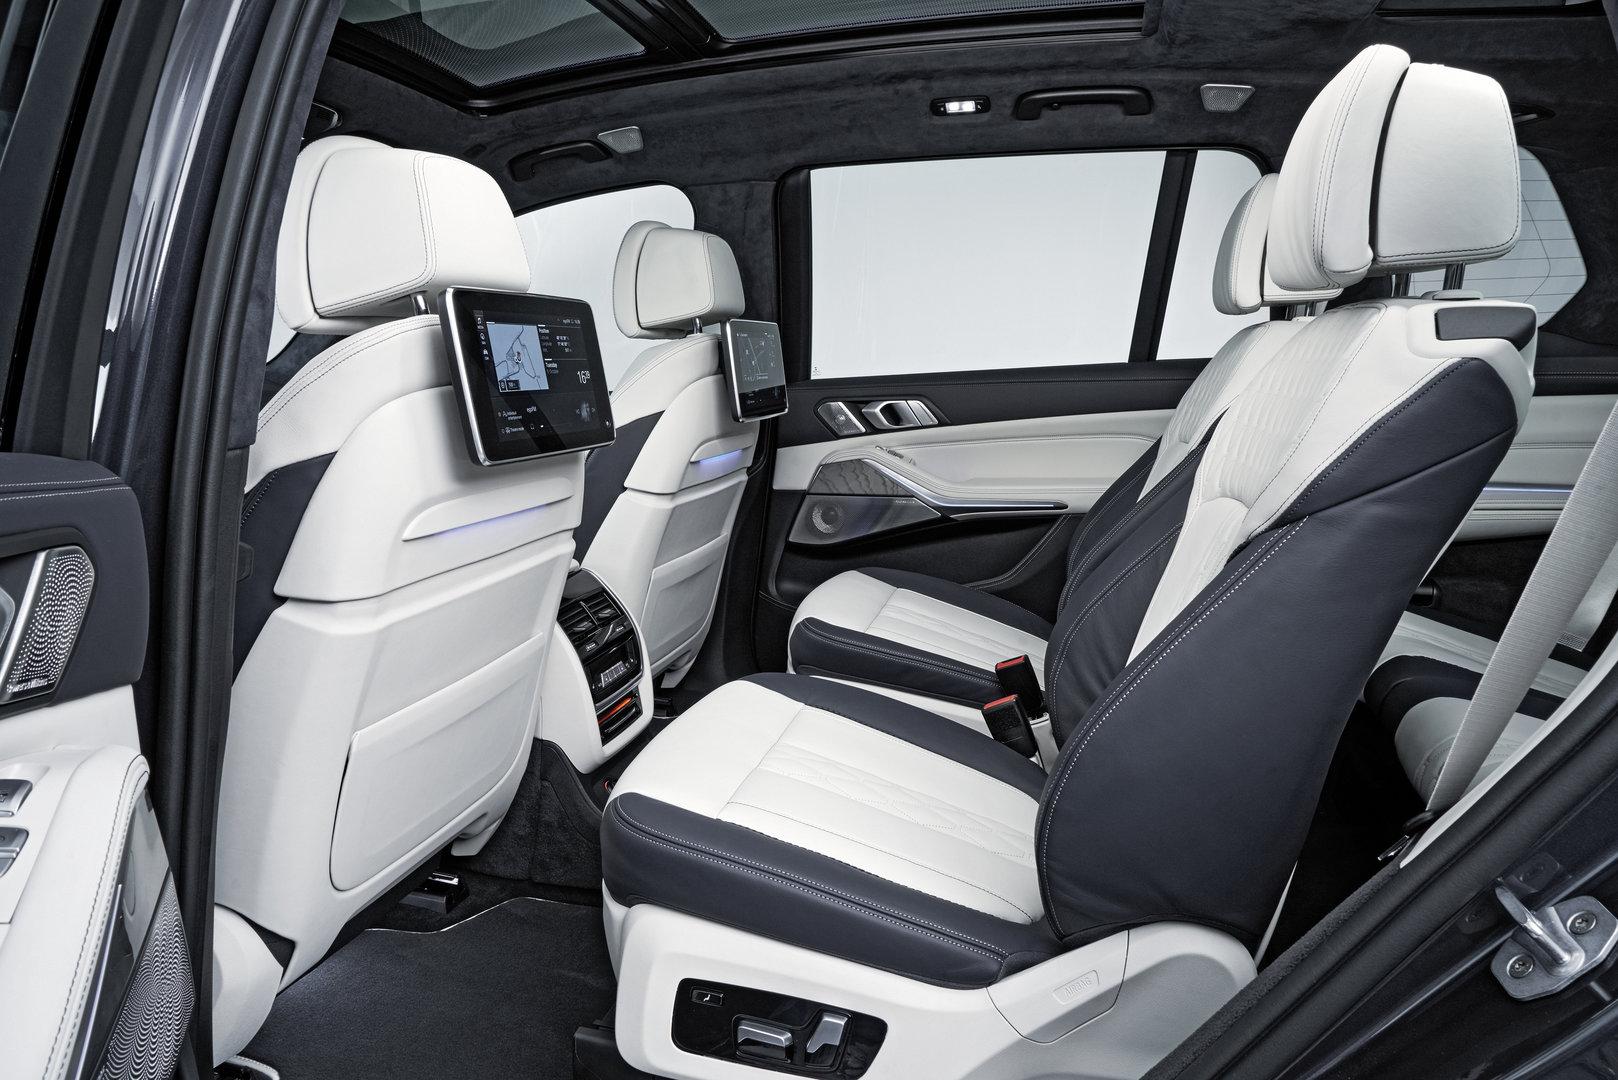 BMW X7 – Rear Seat Entertainment